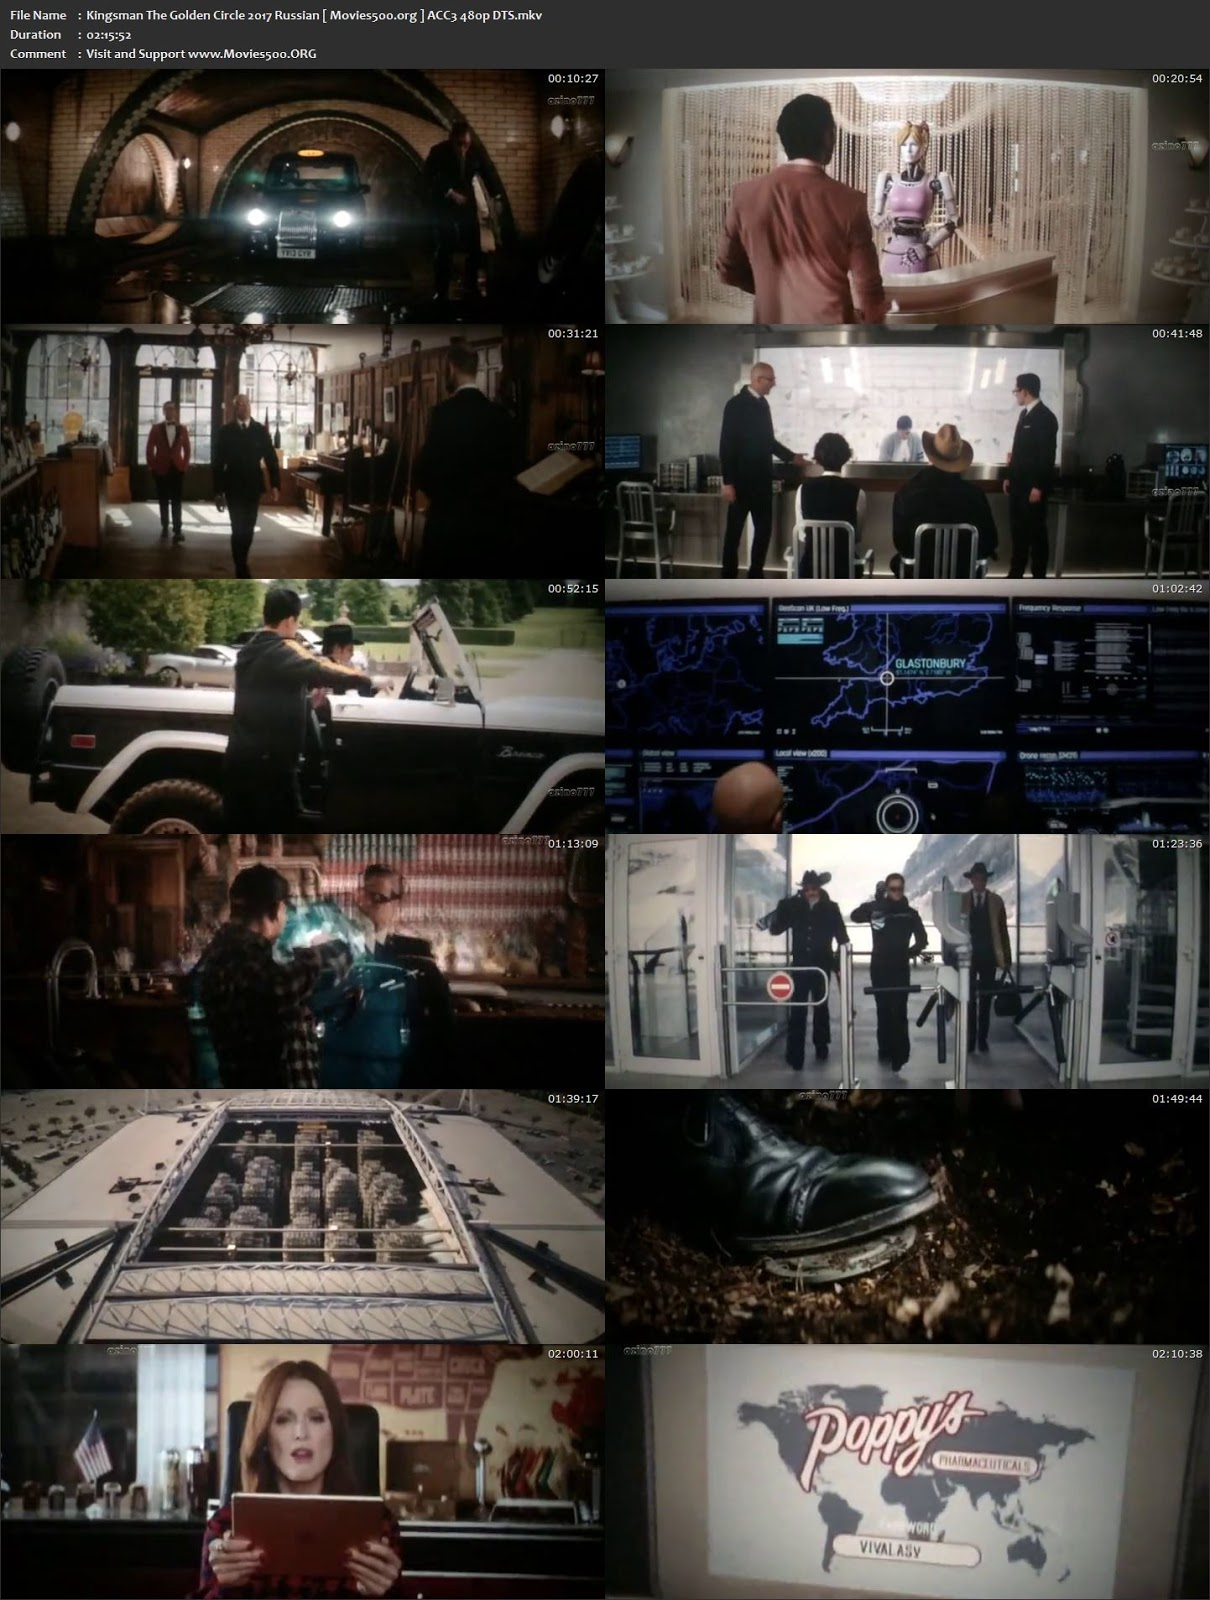 Kingsman The Golden Circle 2017 Full Movie 395MB HDCAM 480p at movies500.site